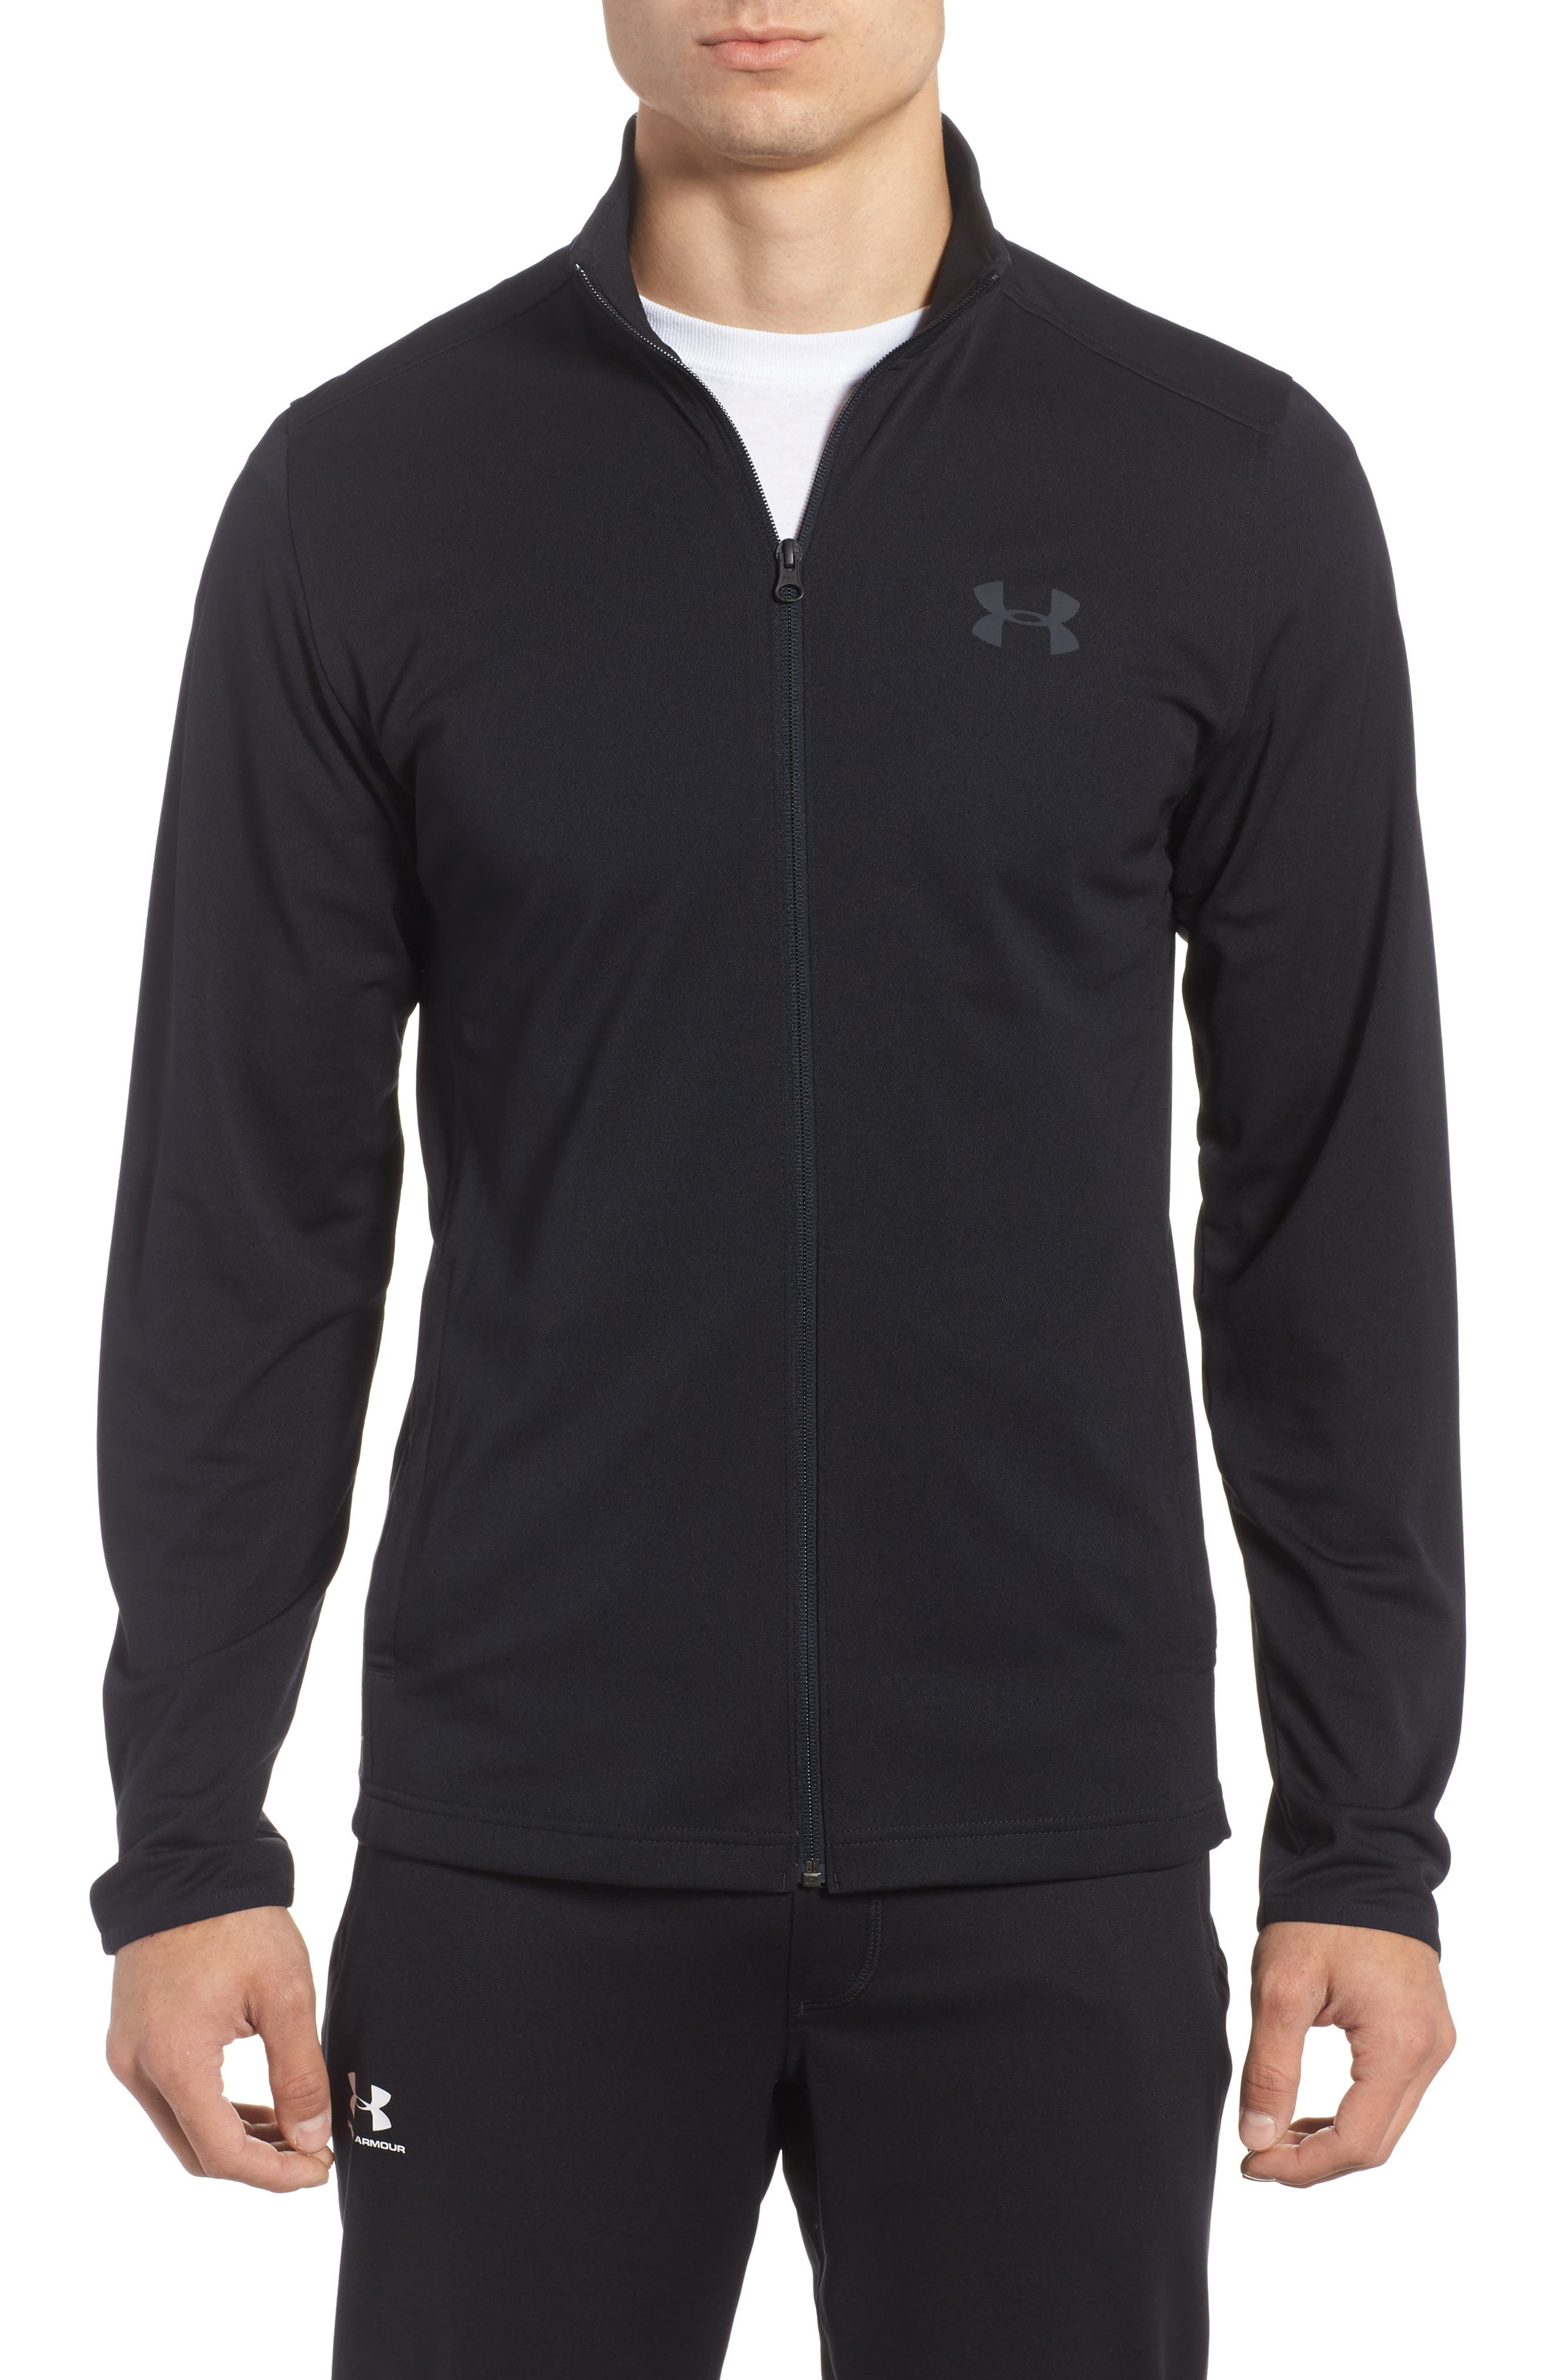 Main Image - Under Armour HeatGear® Regular Fit Maverick Jacket